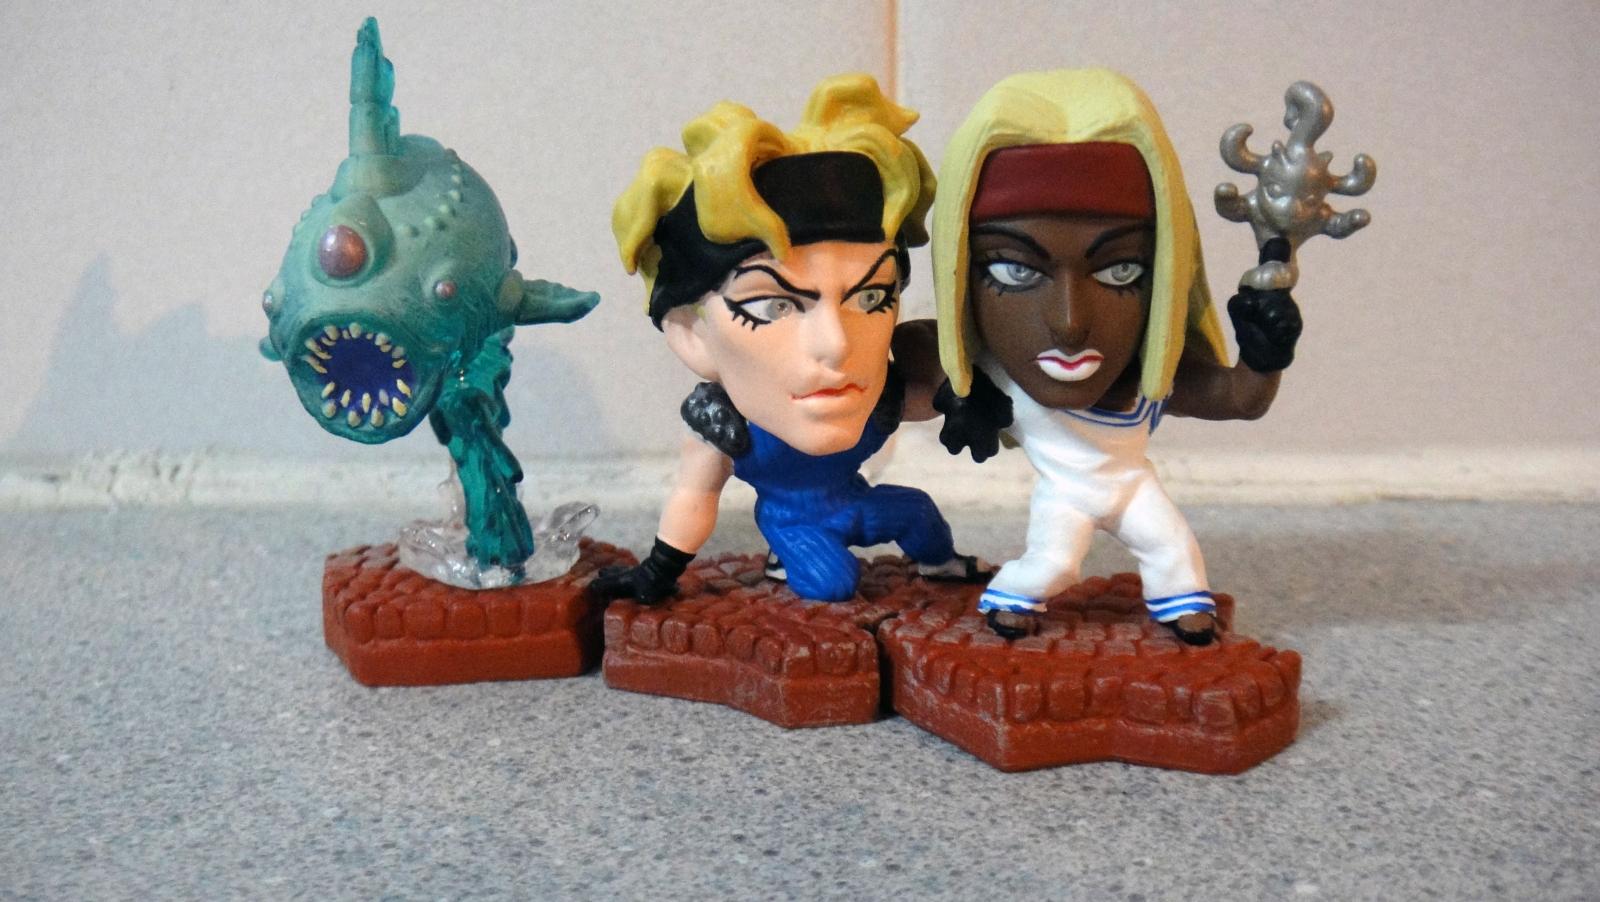 jojo_no_kimyou_na_bouken tokimeki.com chara_heroes squalo clash tizziano talking_head